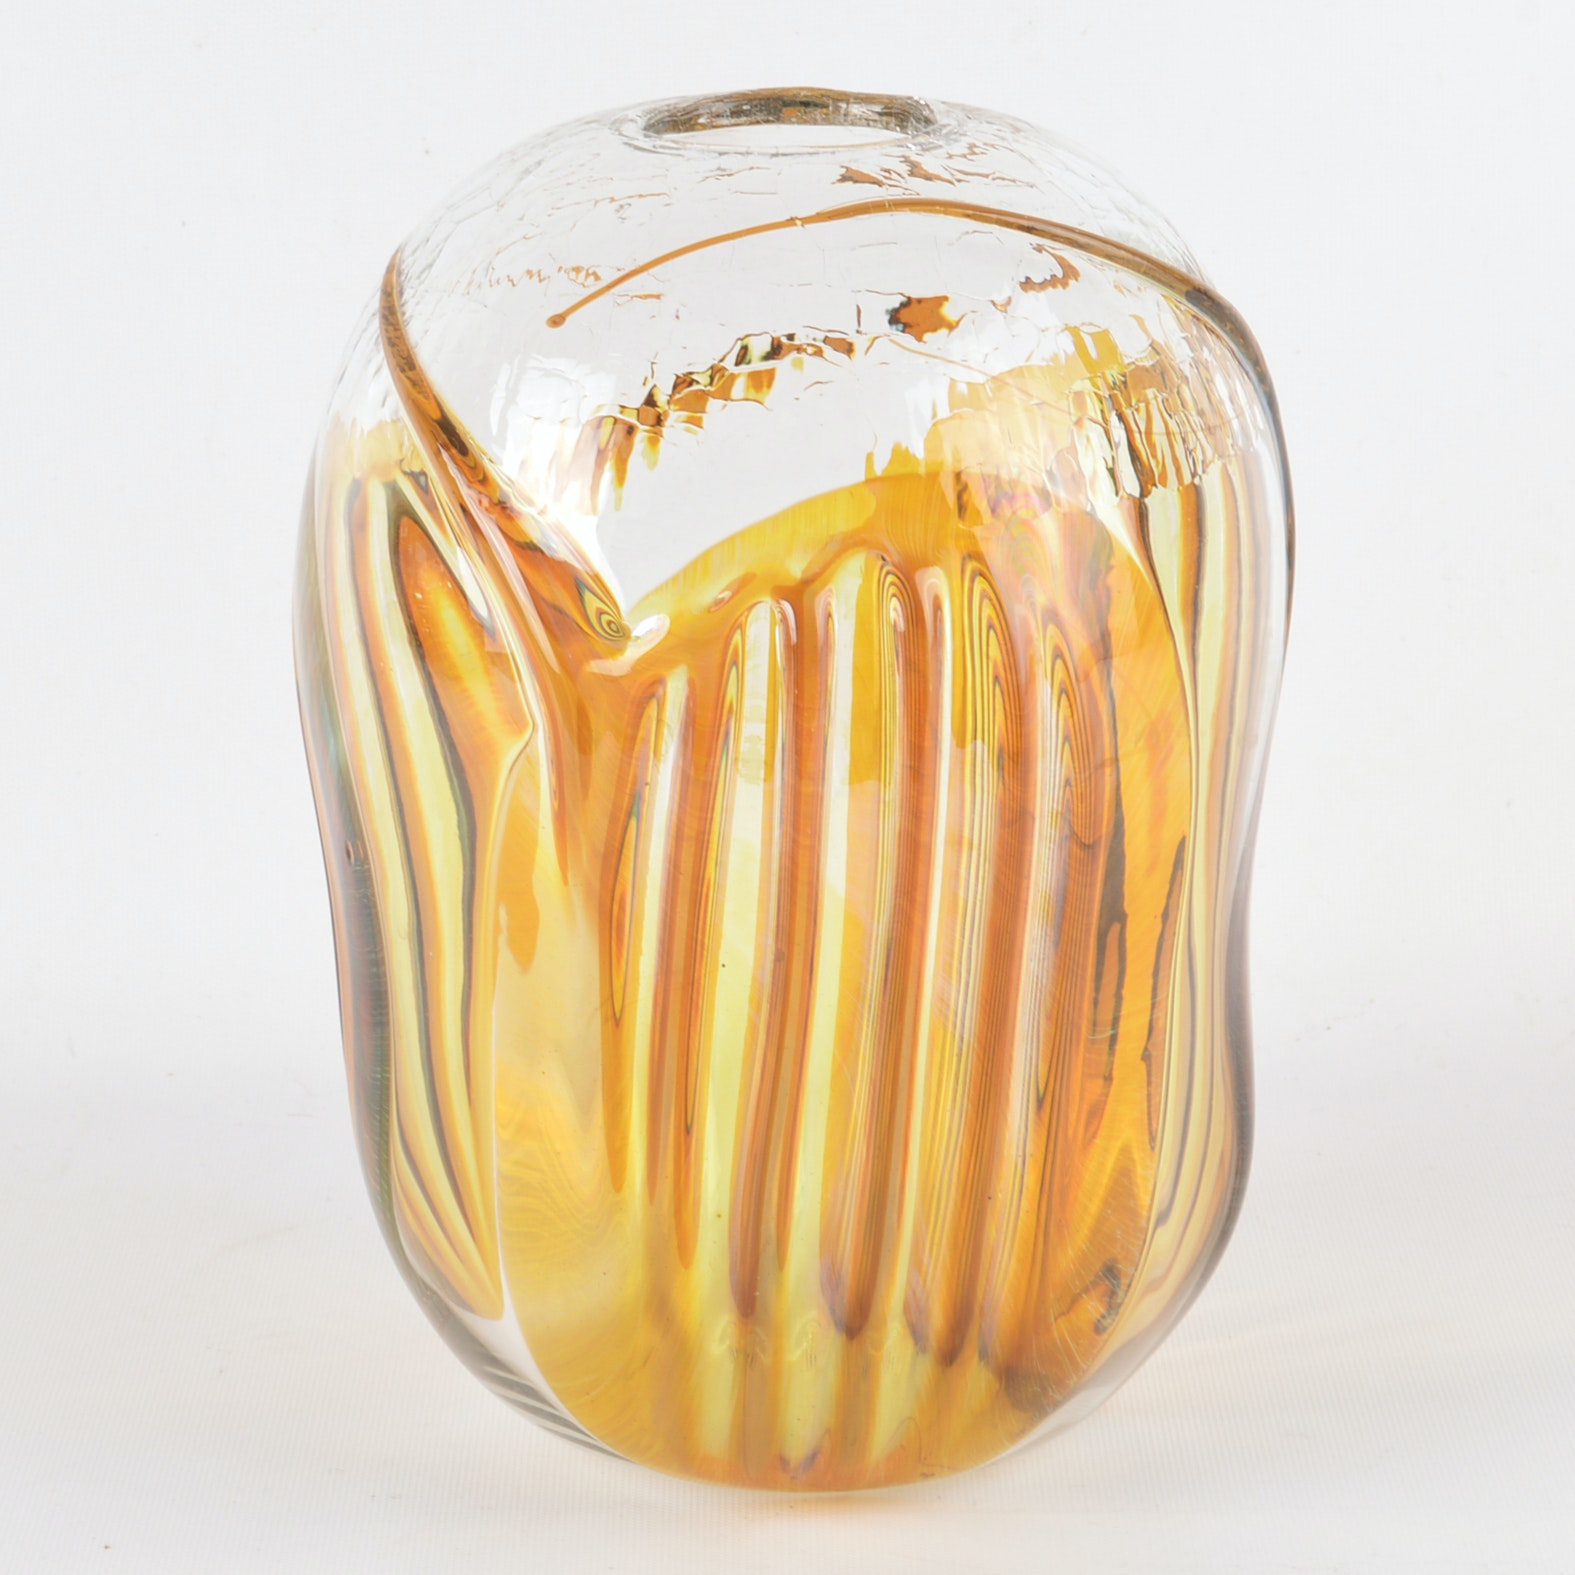 Peter Bramhall 1982 Art Glass Vase